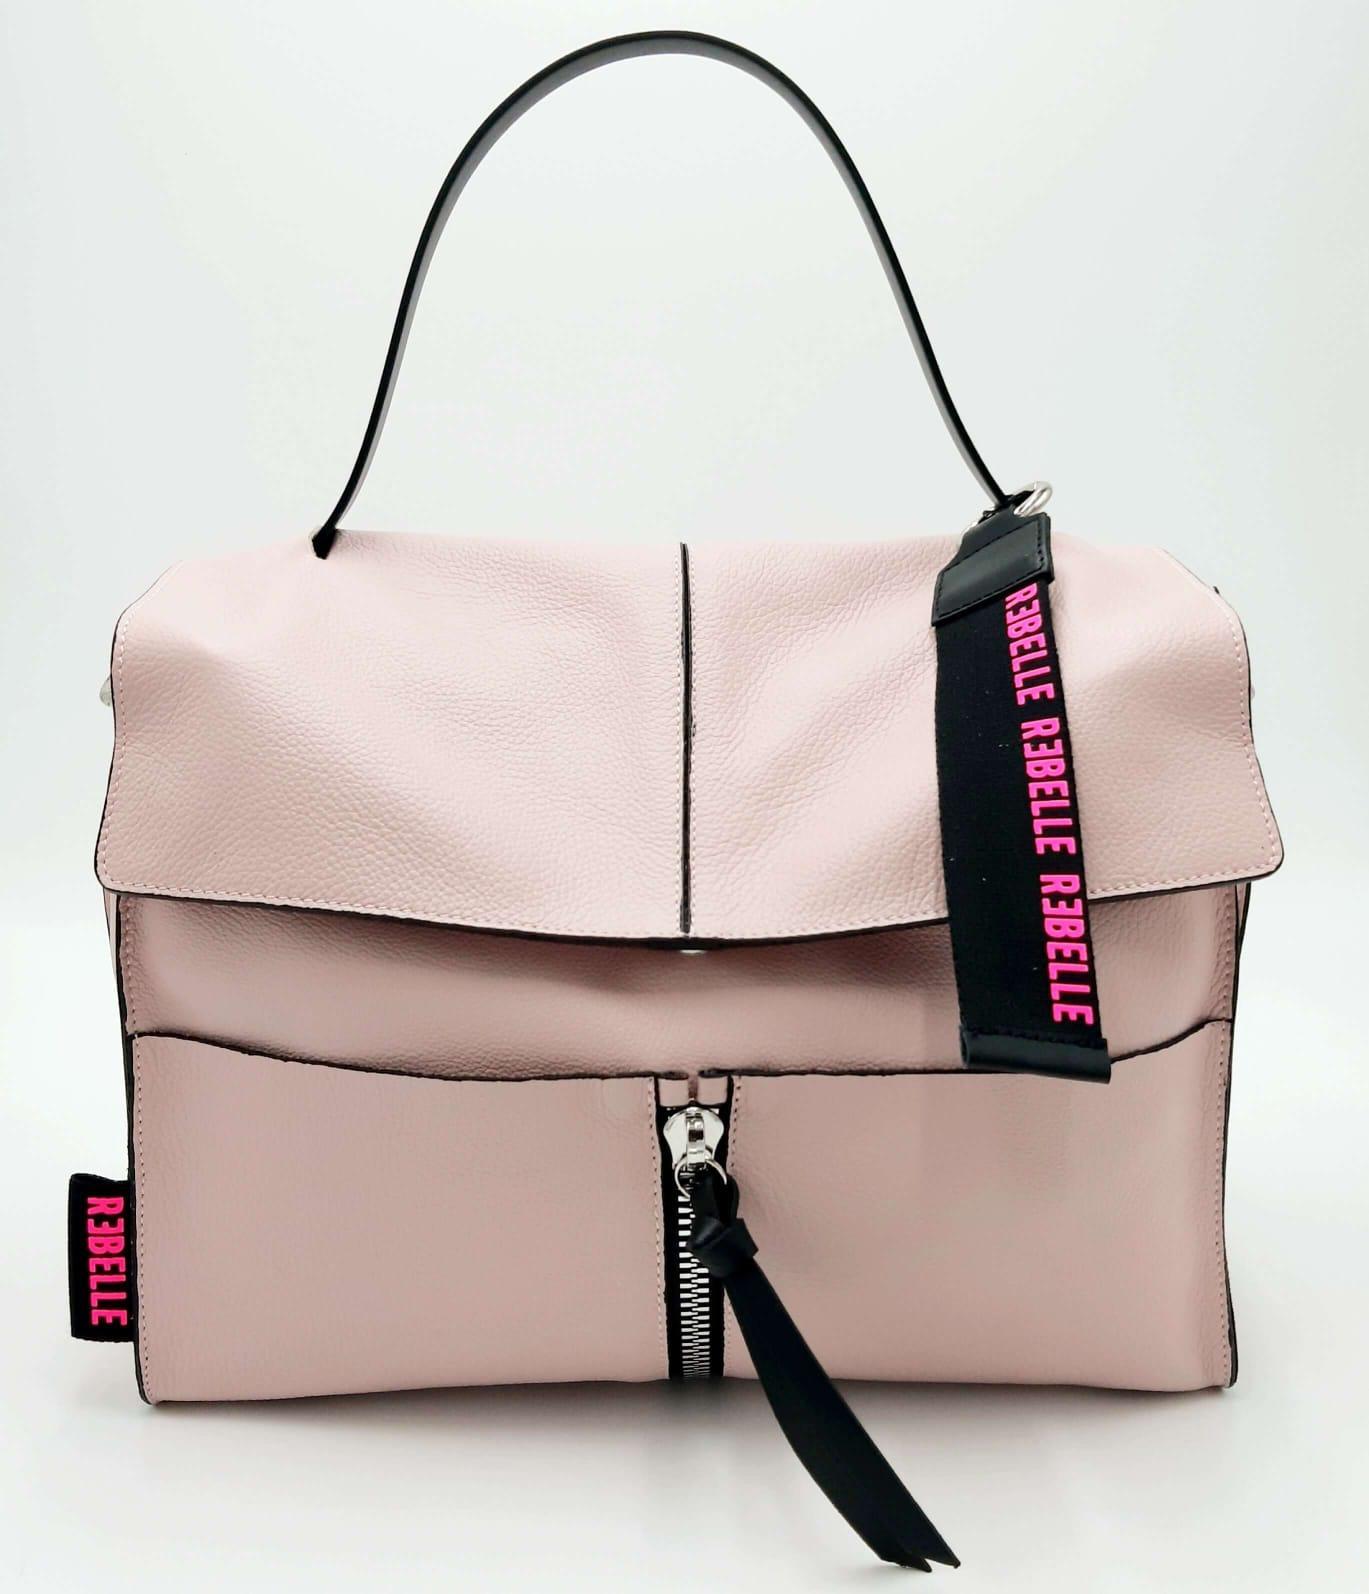 Cartella Clio in pelle bottalata rosa REBELLE